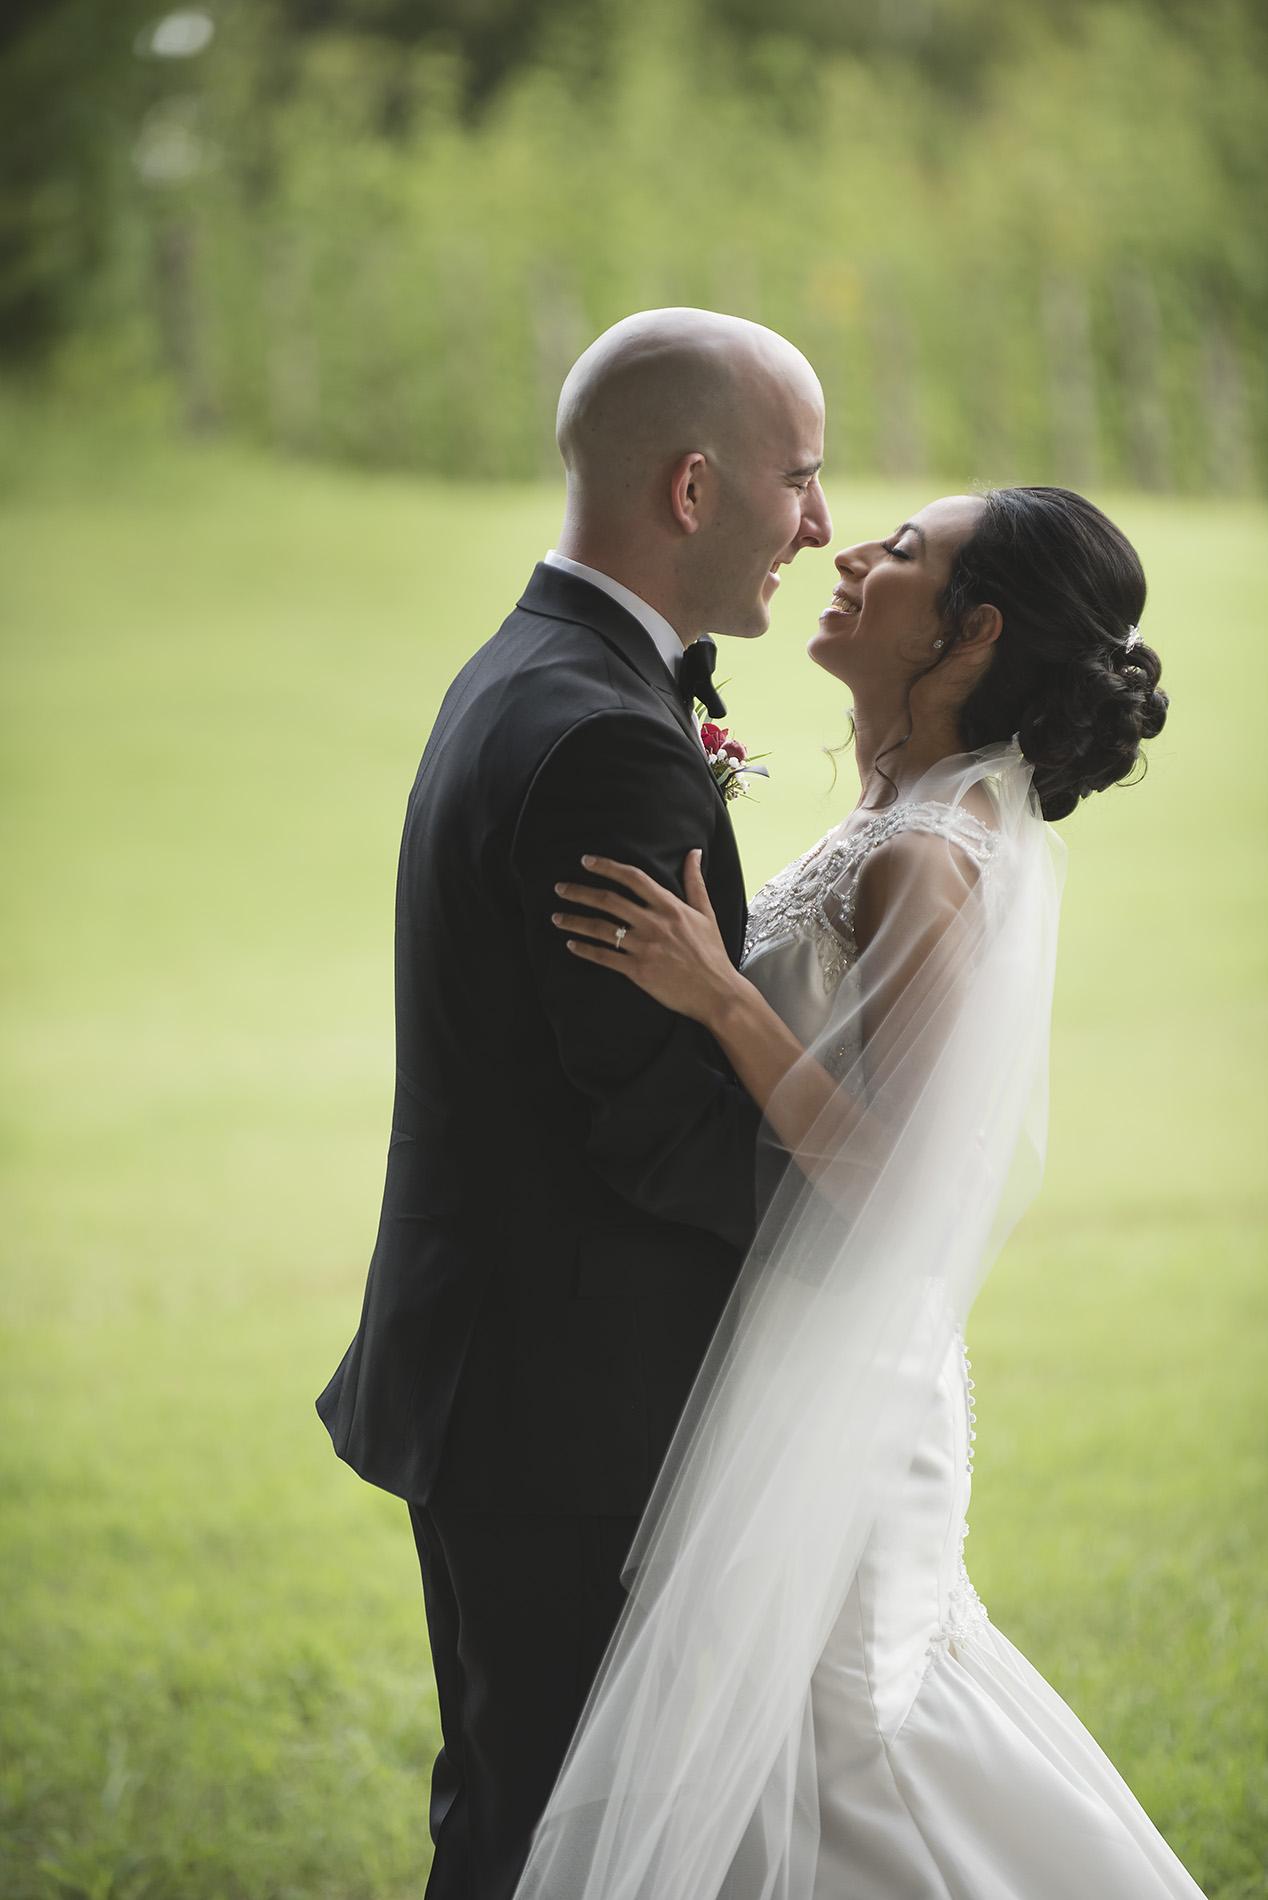 Houston-venue-Olde-Dobbin-Station-Romantic-Classic-Wedding-Photographer-027.jpg